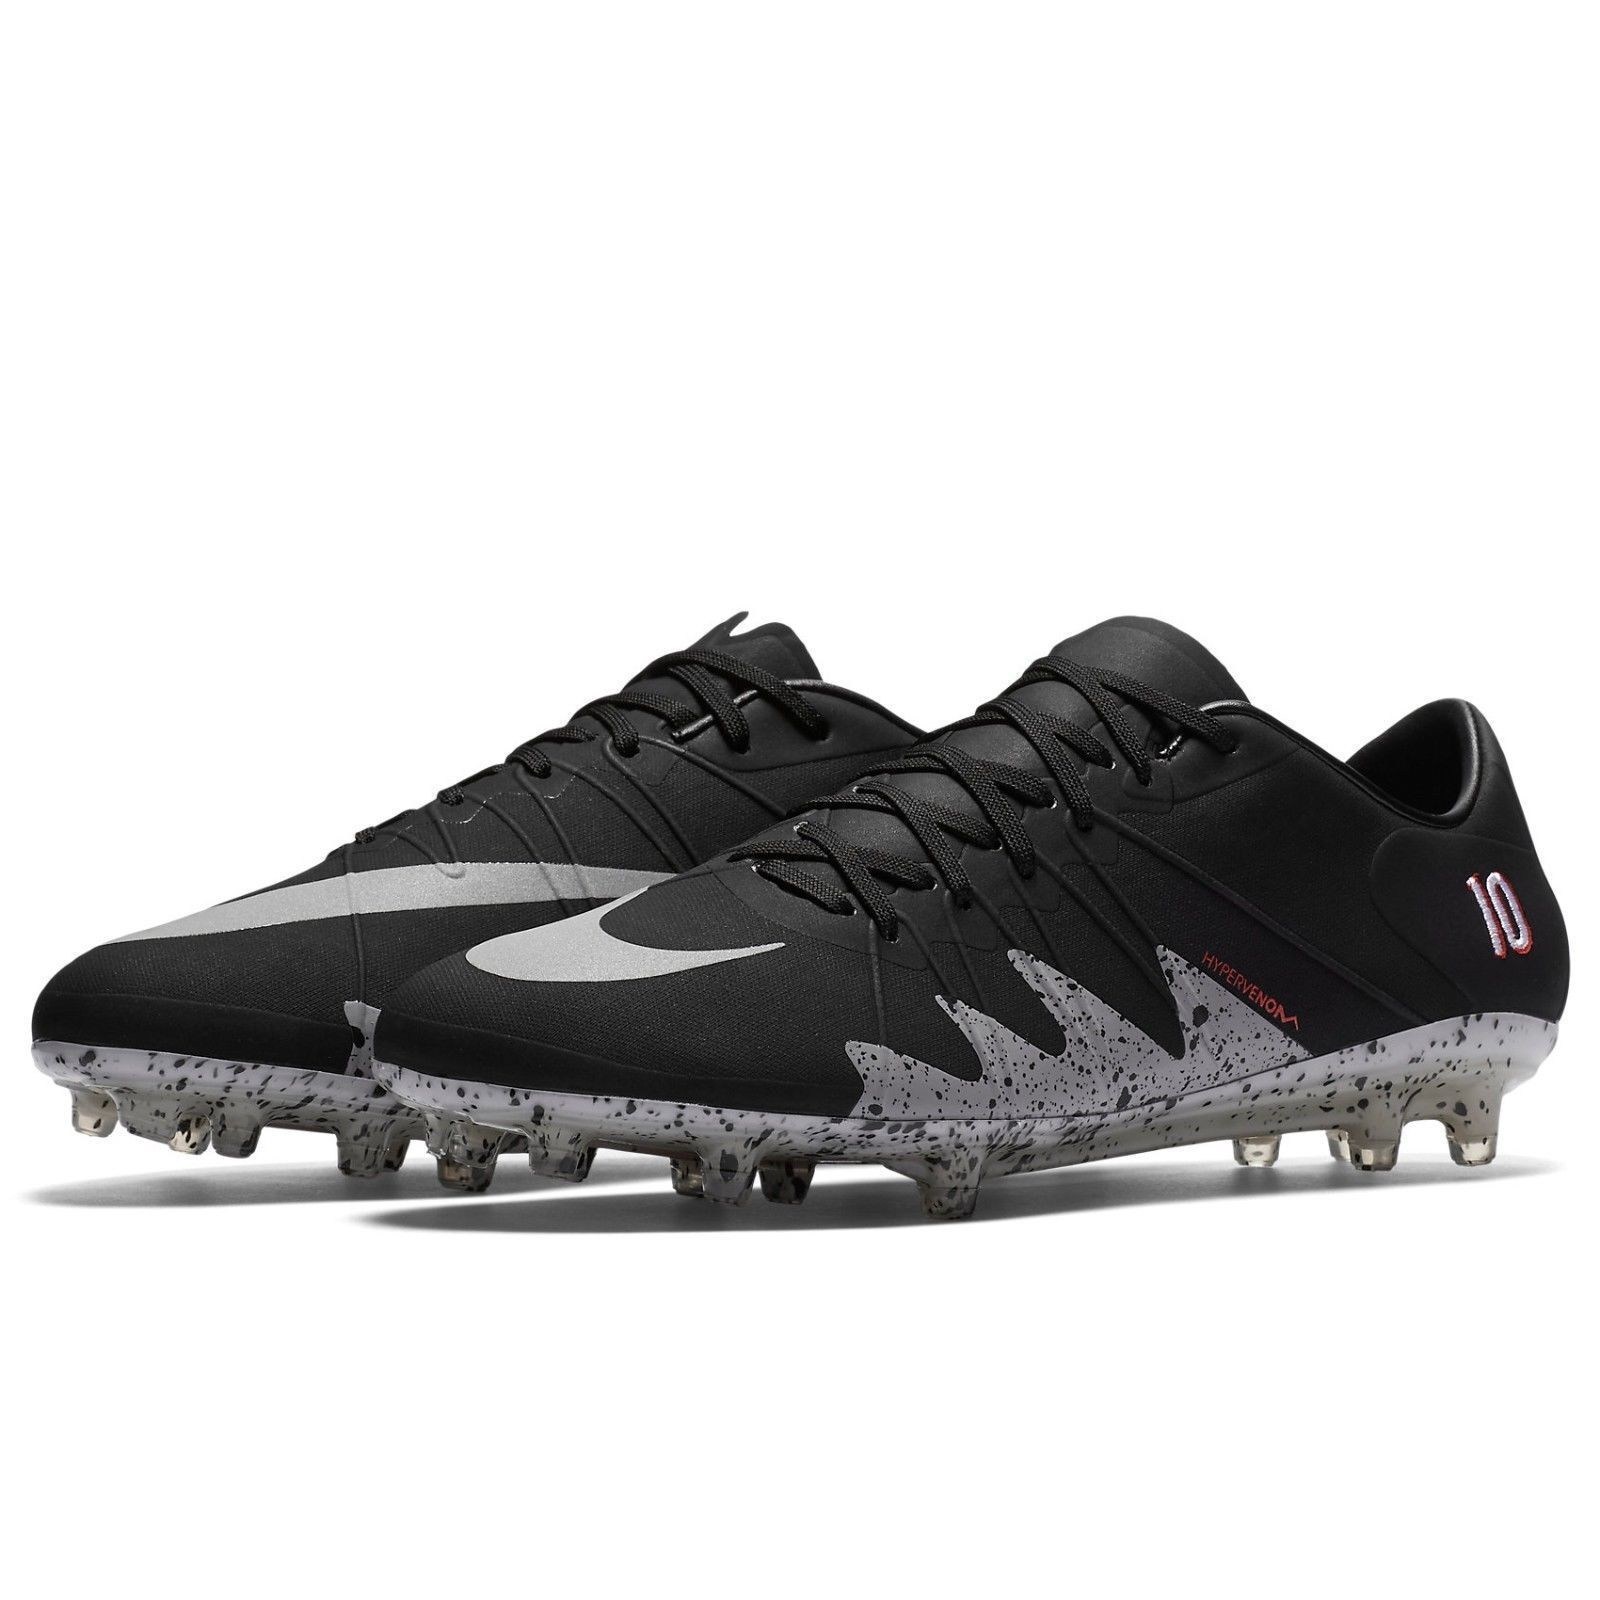 Nike Hypervenom Phinish NJR FG Neymar x Jordan SoldOut Soccer Cleats 820122 006